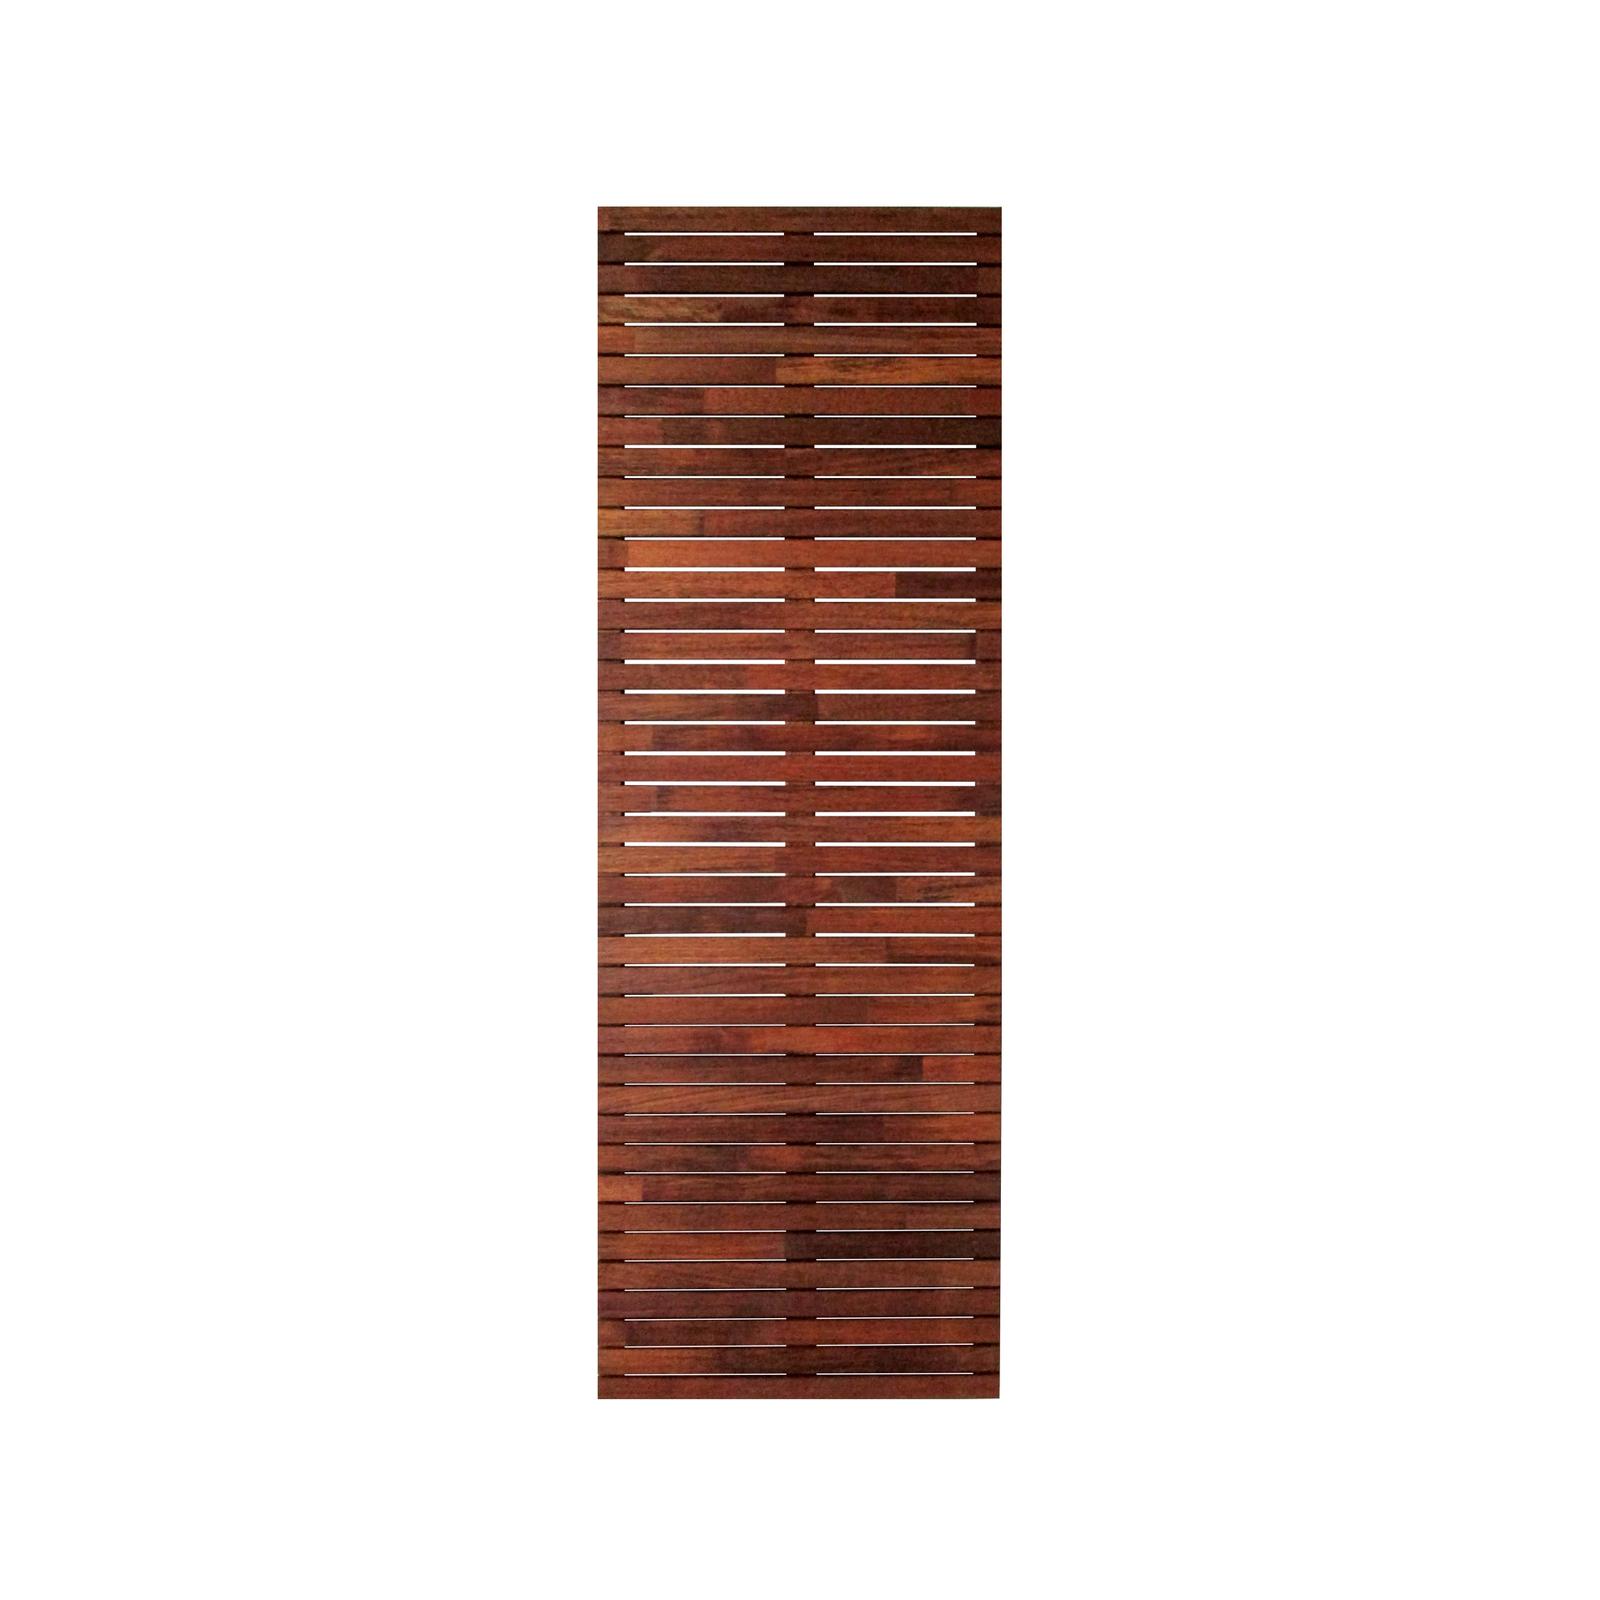 SpecRite 1800 x 600mm Pre-Oiled Merbau Garden Fence Panel